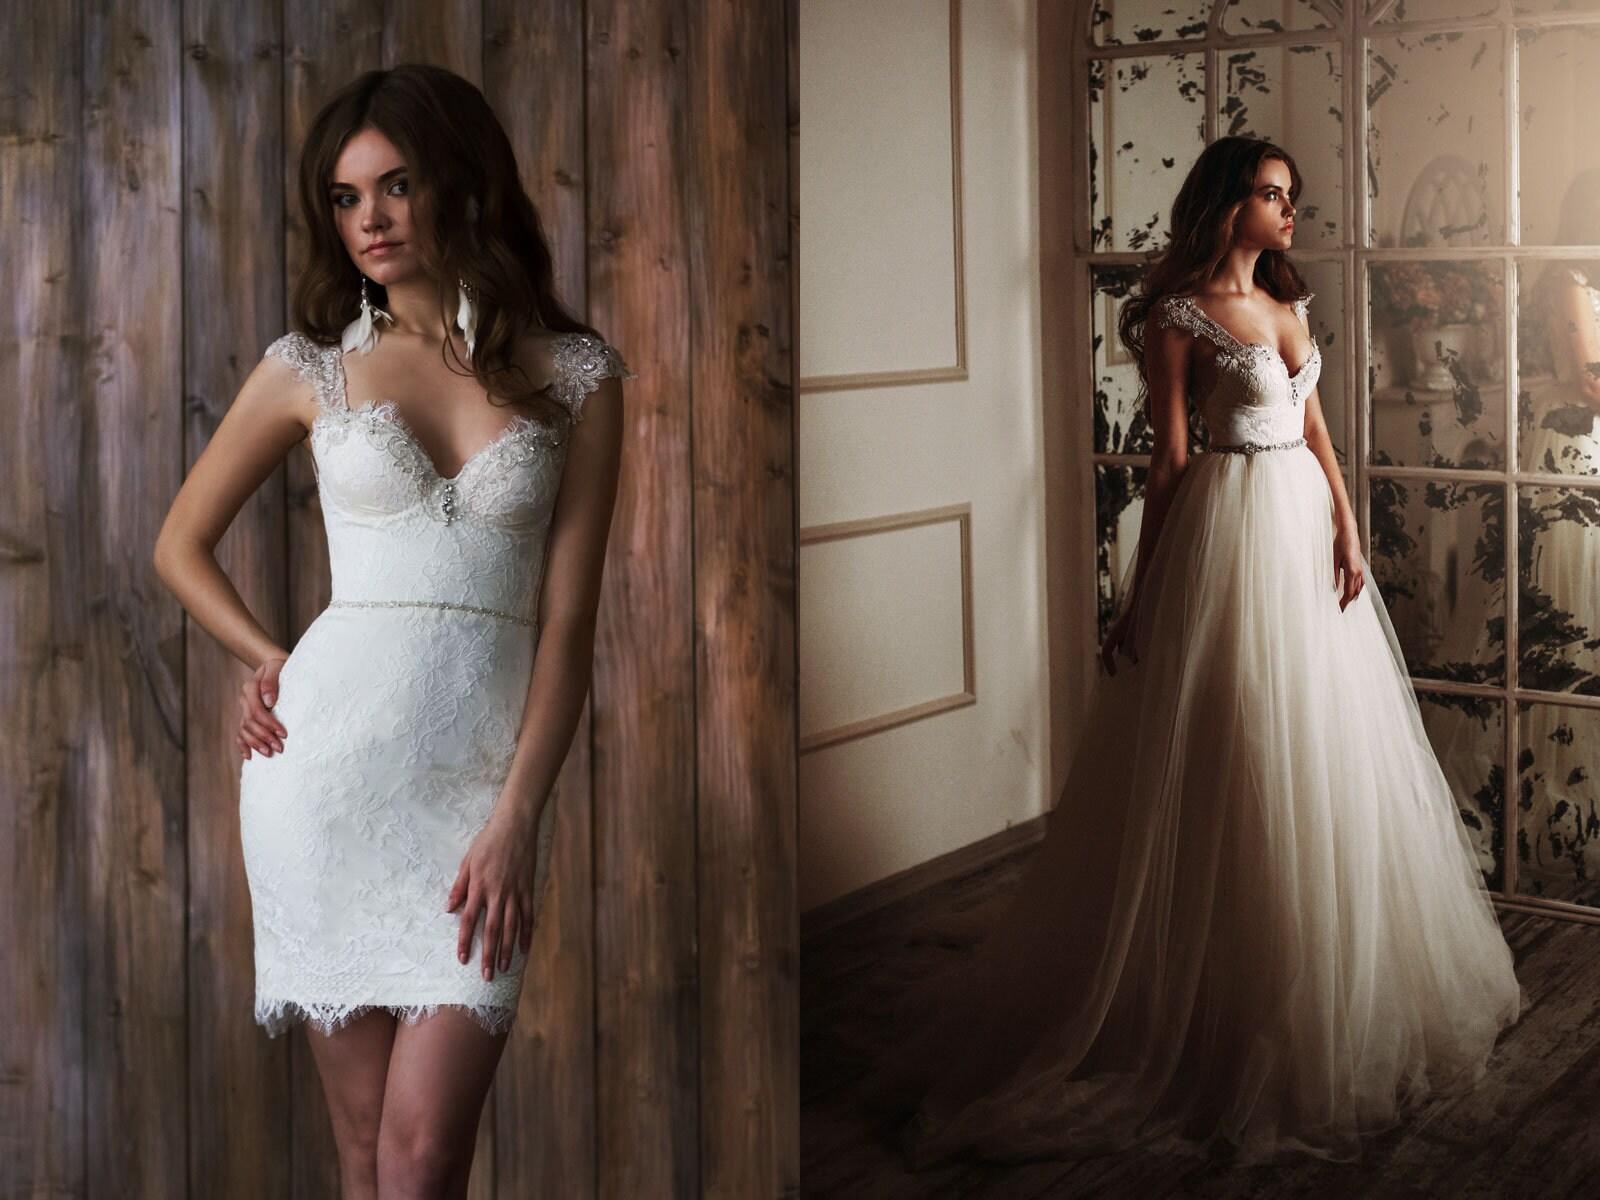 Sparkling Wedding Dress Transformer For Princess Tulle Skirt Etsy